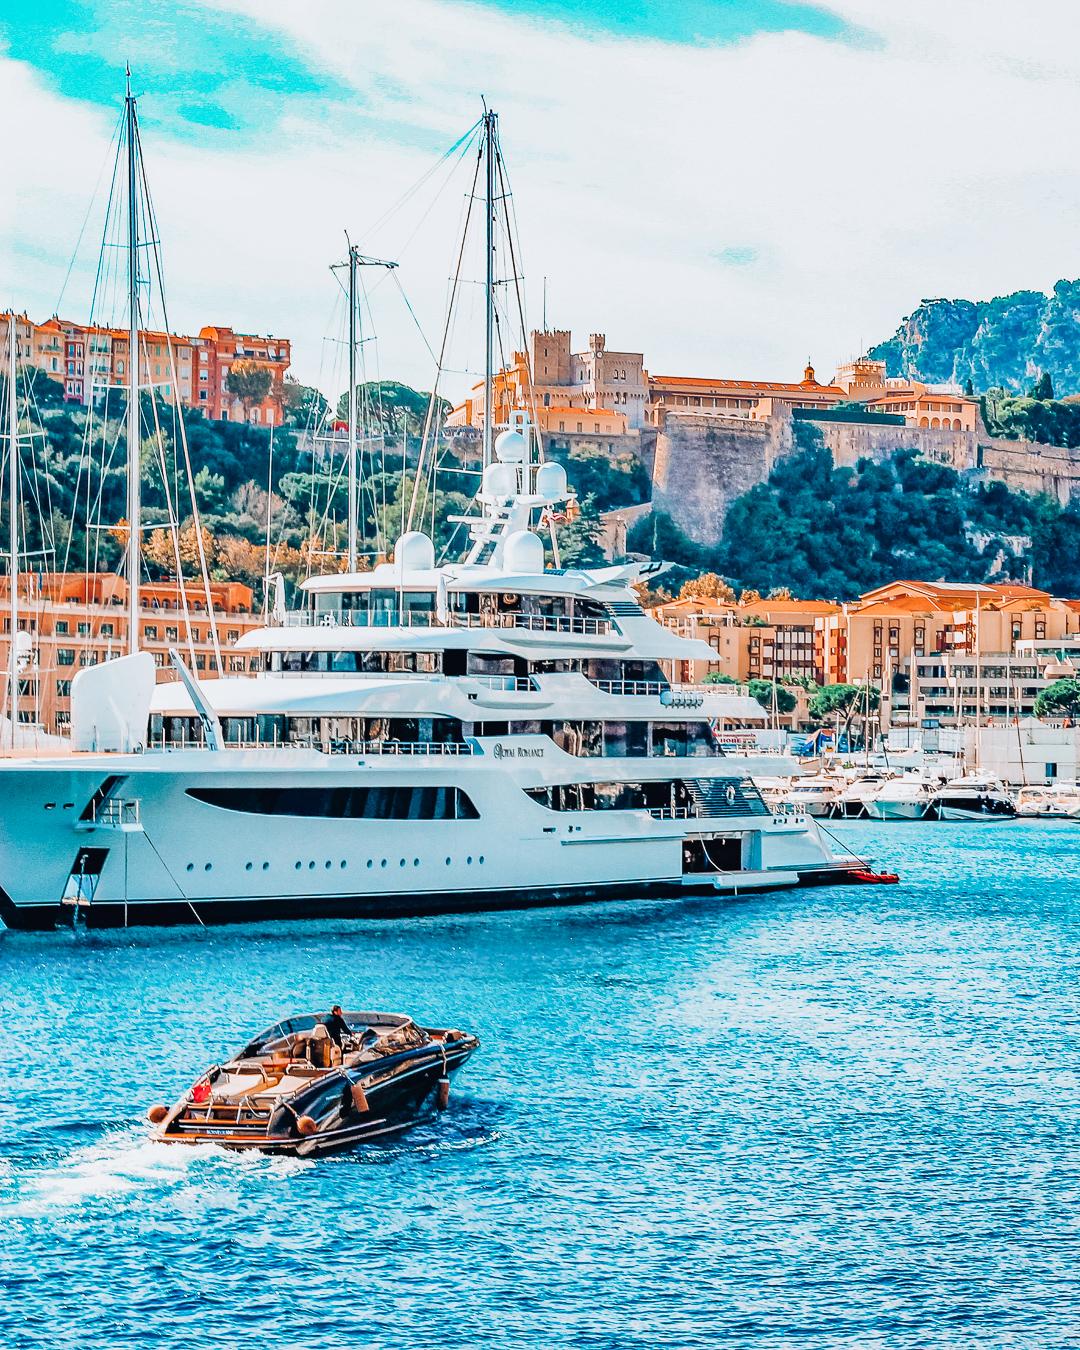 Yacht in blue water